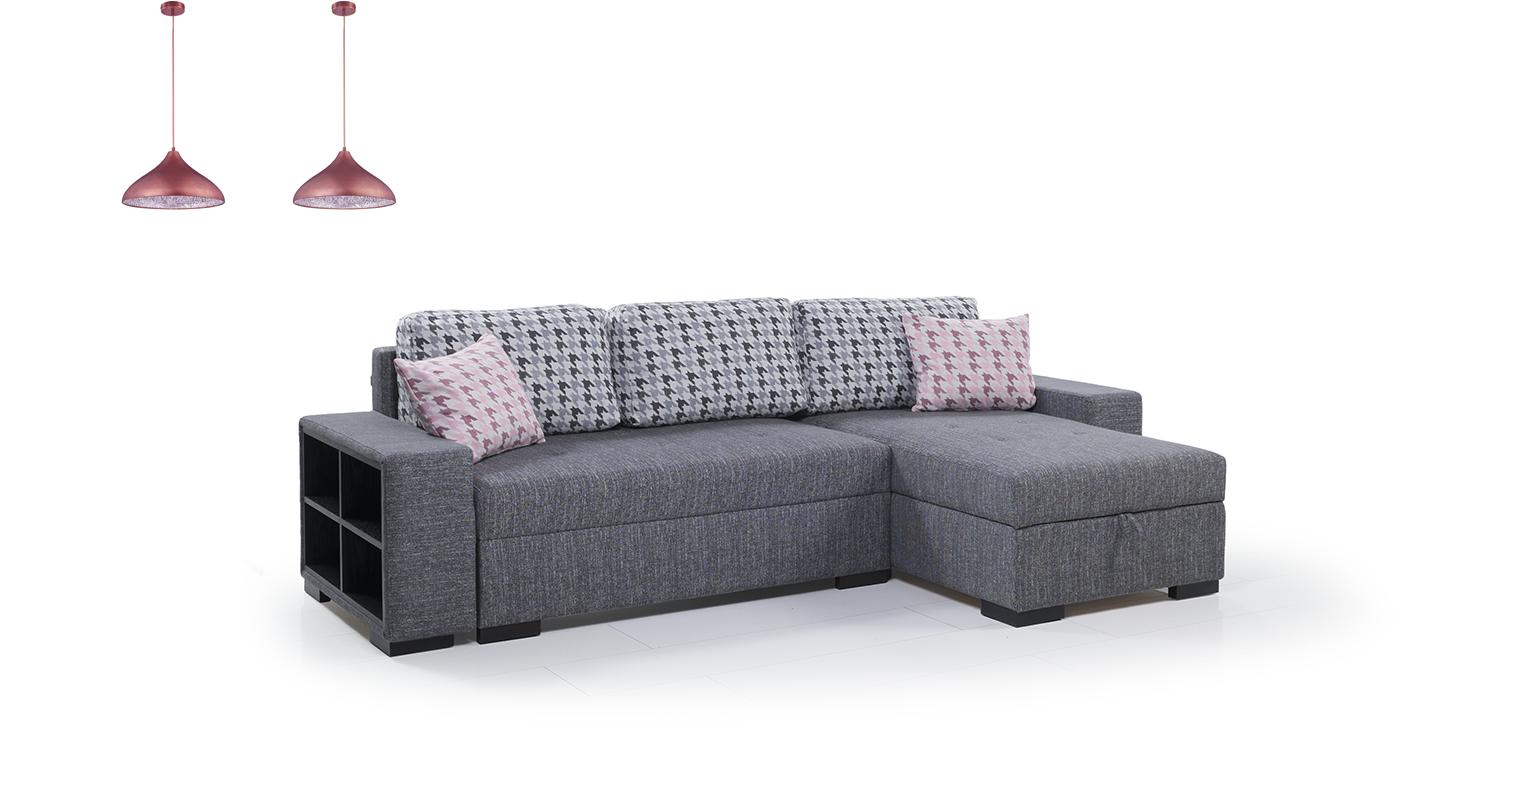 Extensible sofa goya tediva - Sofa extensible ...